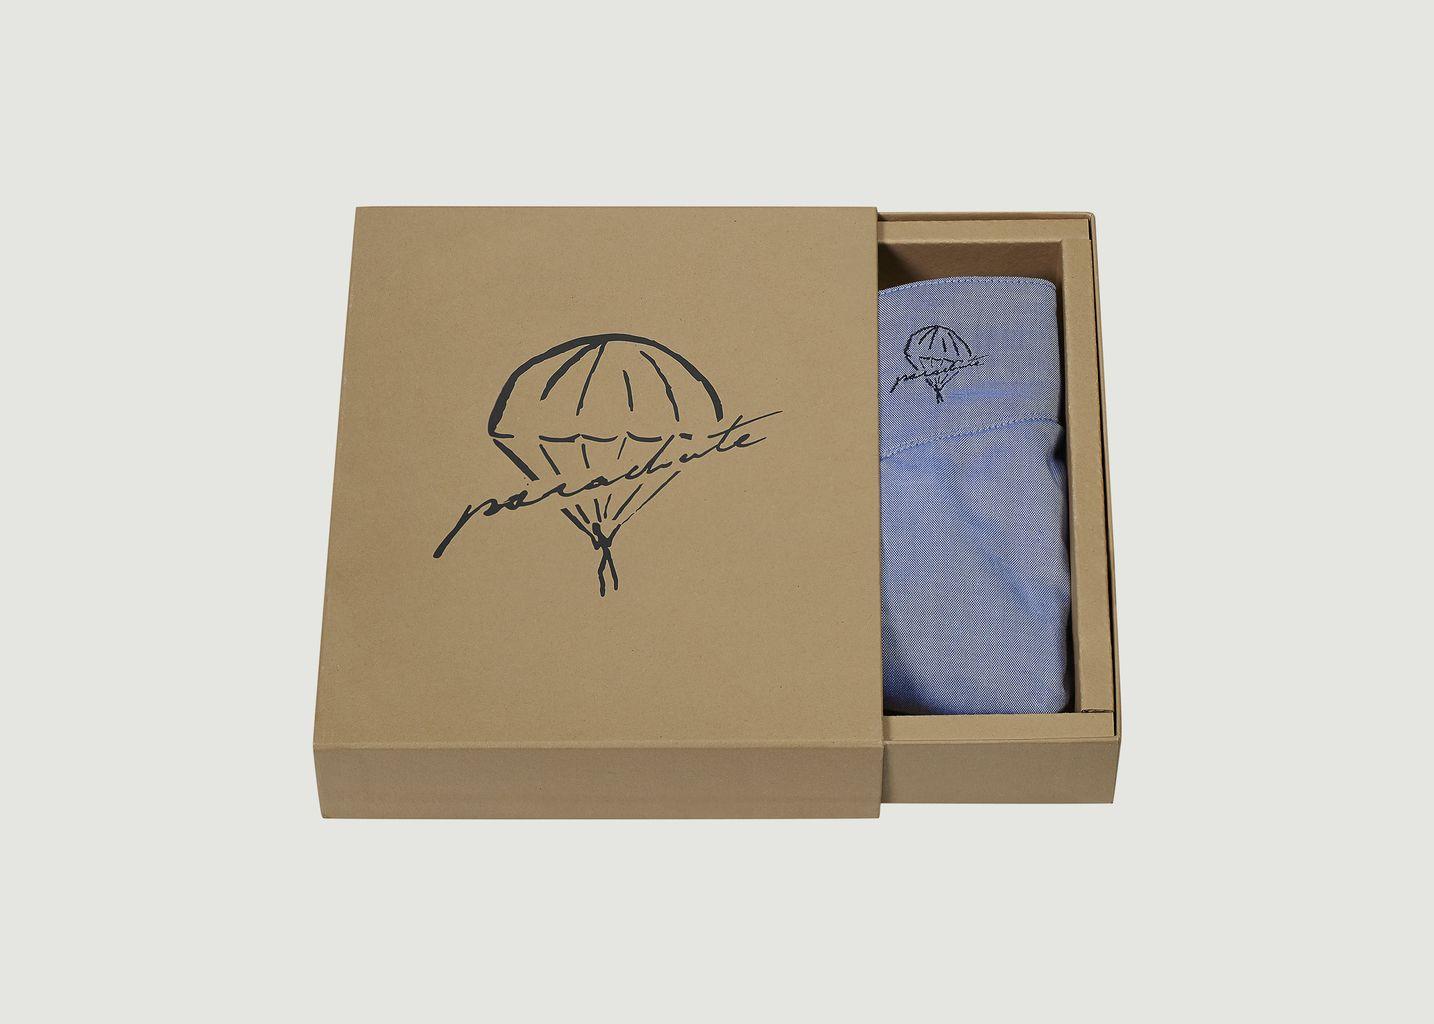 Caleçon Jean-Paul - Parachute